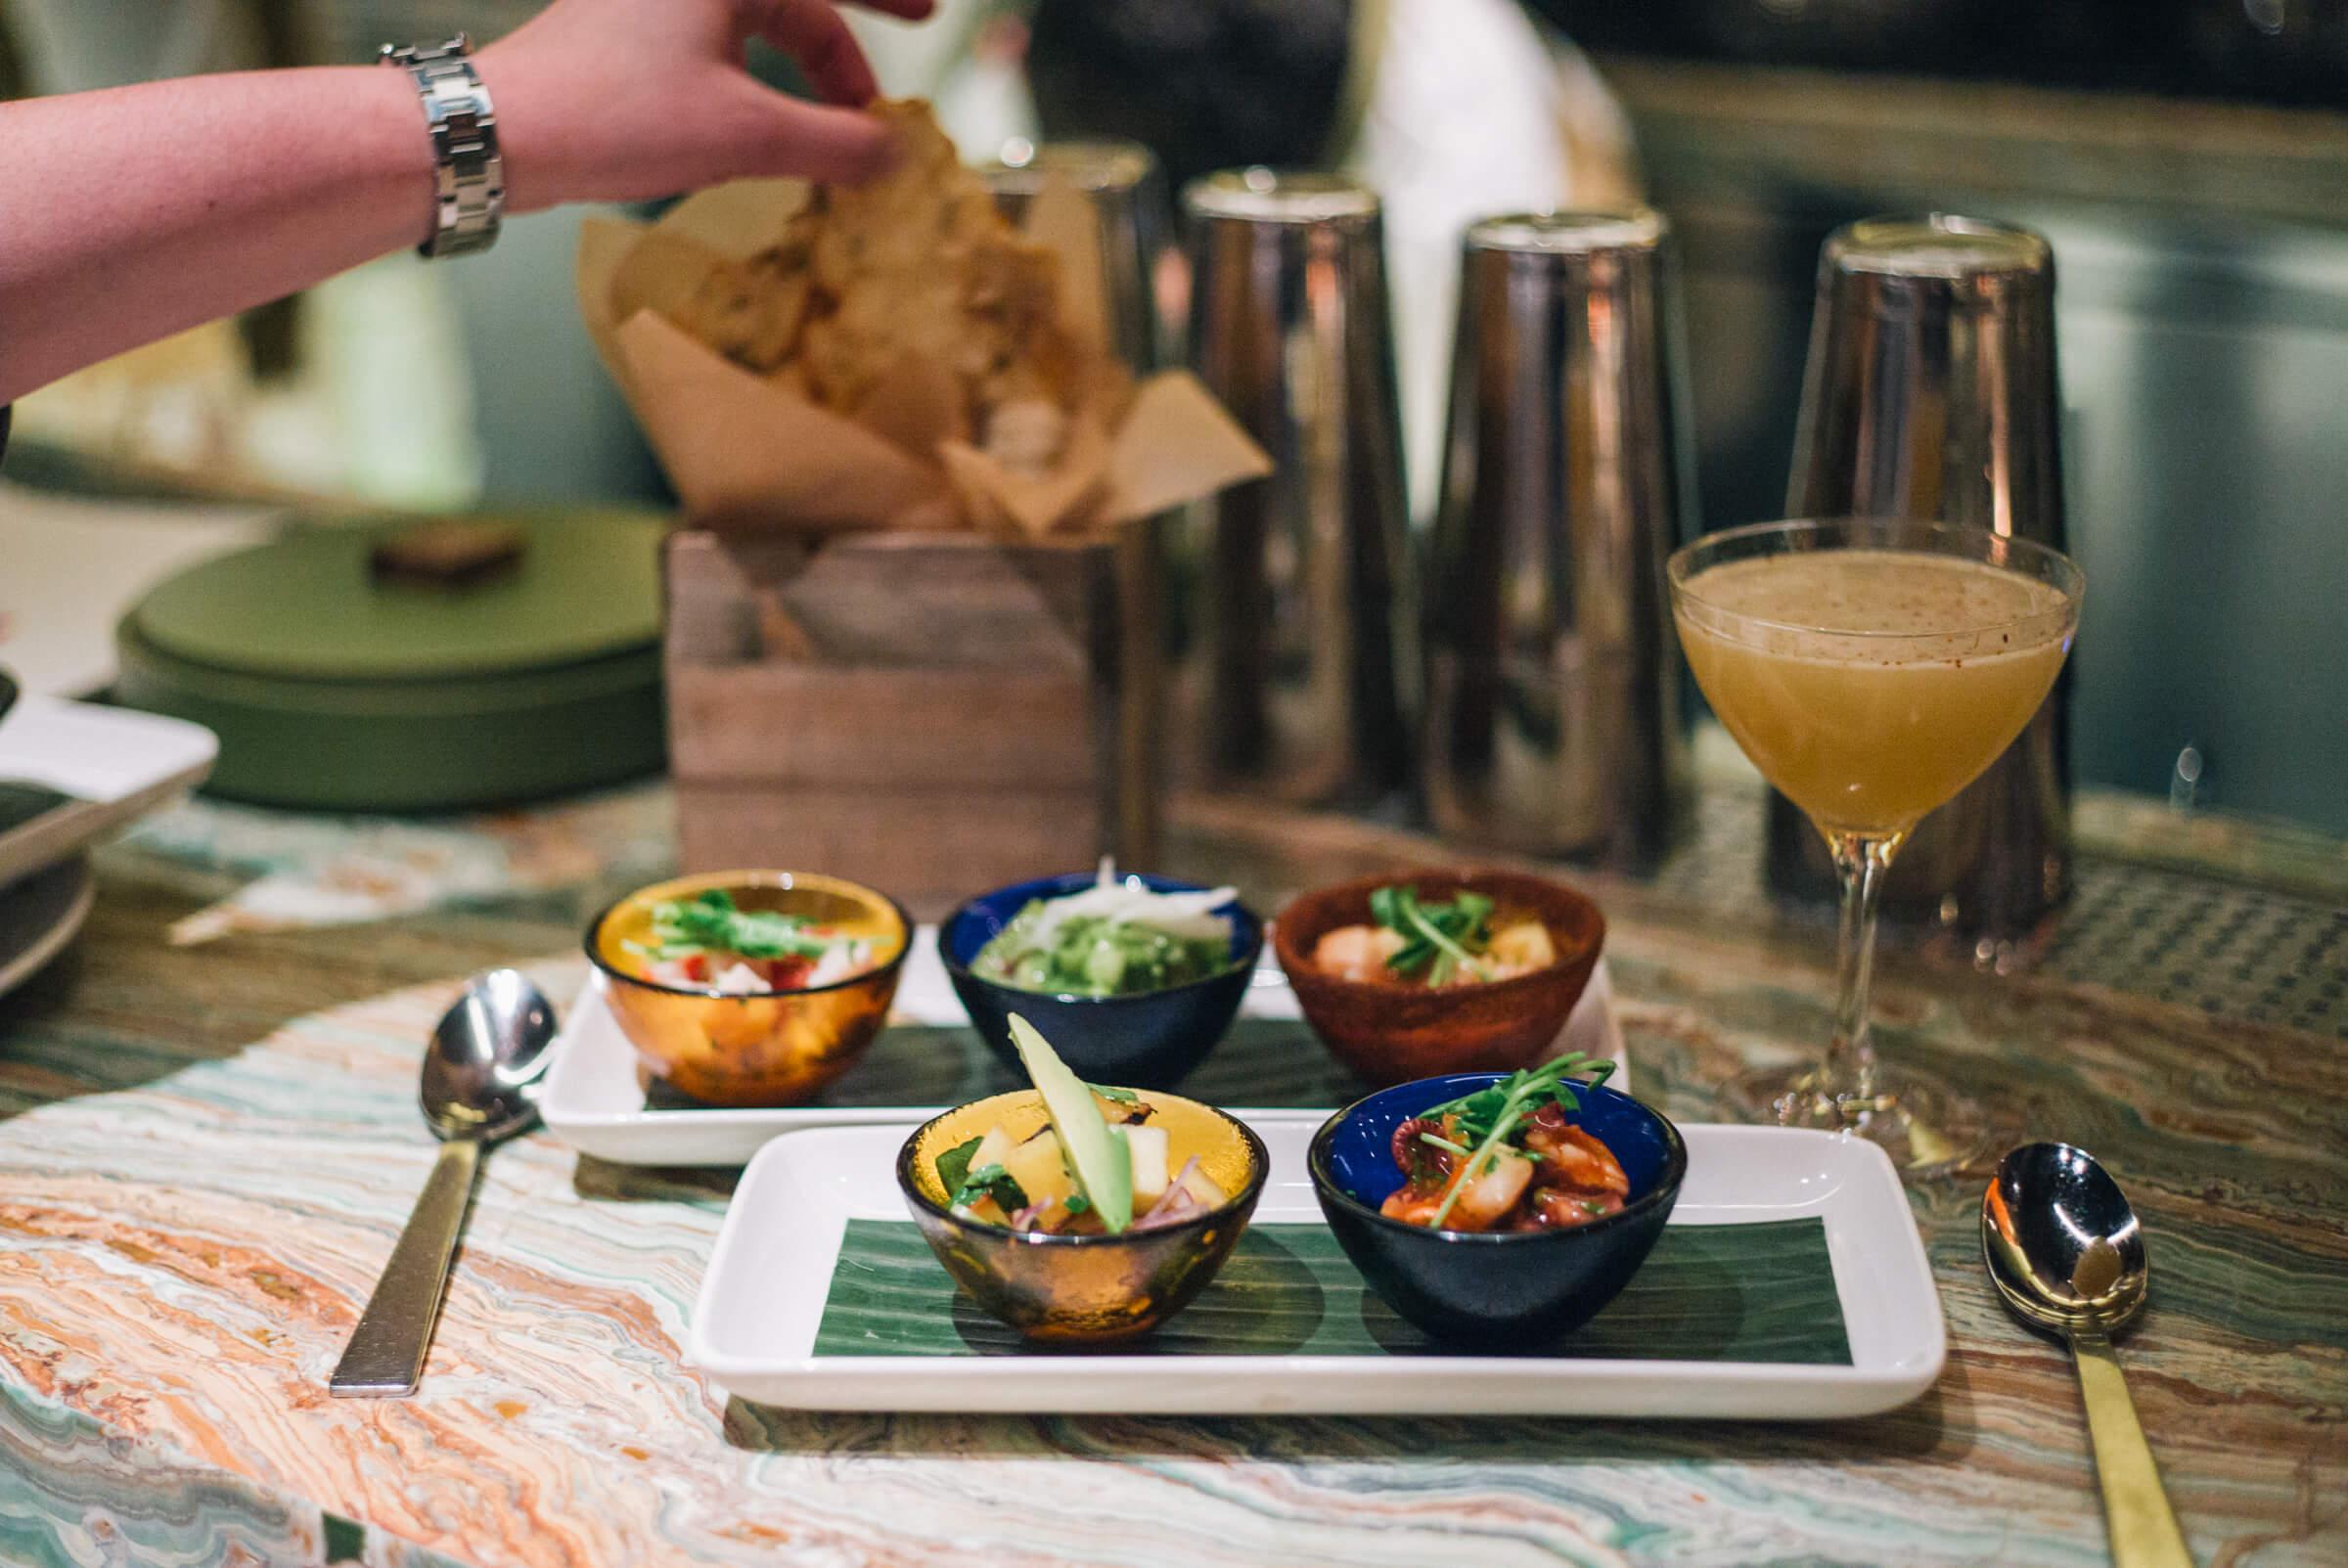 Ceviche sampler at Lena Brava restaurant in Chicago, The Taste SF